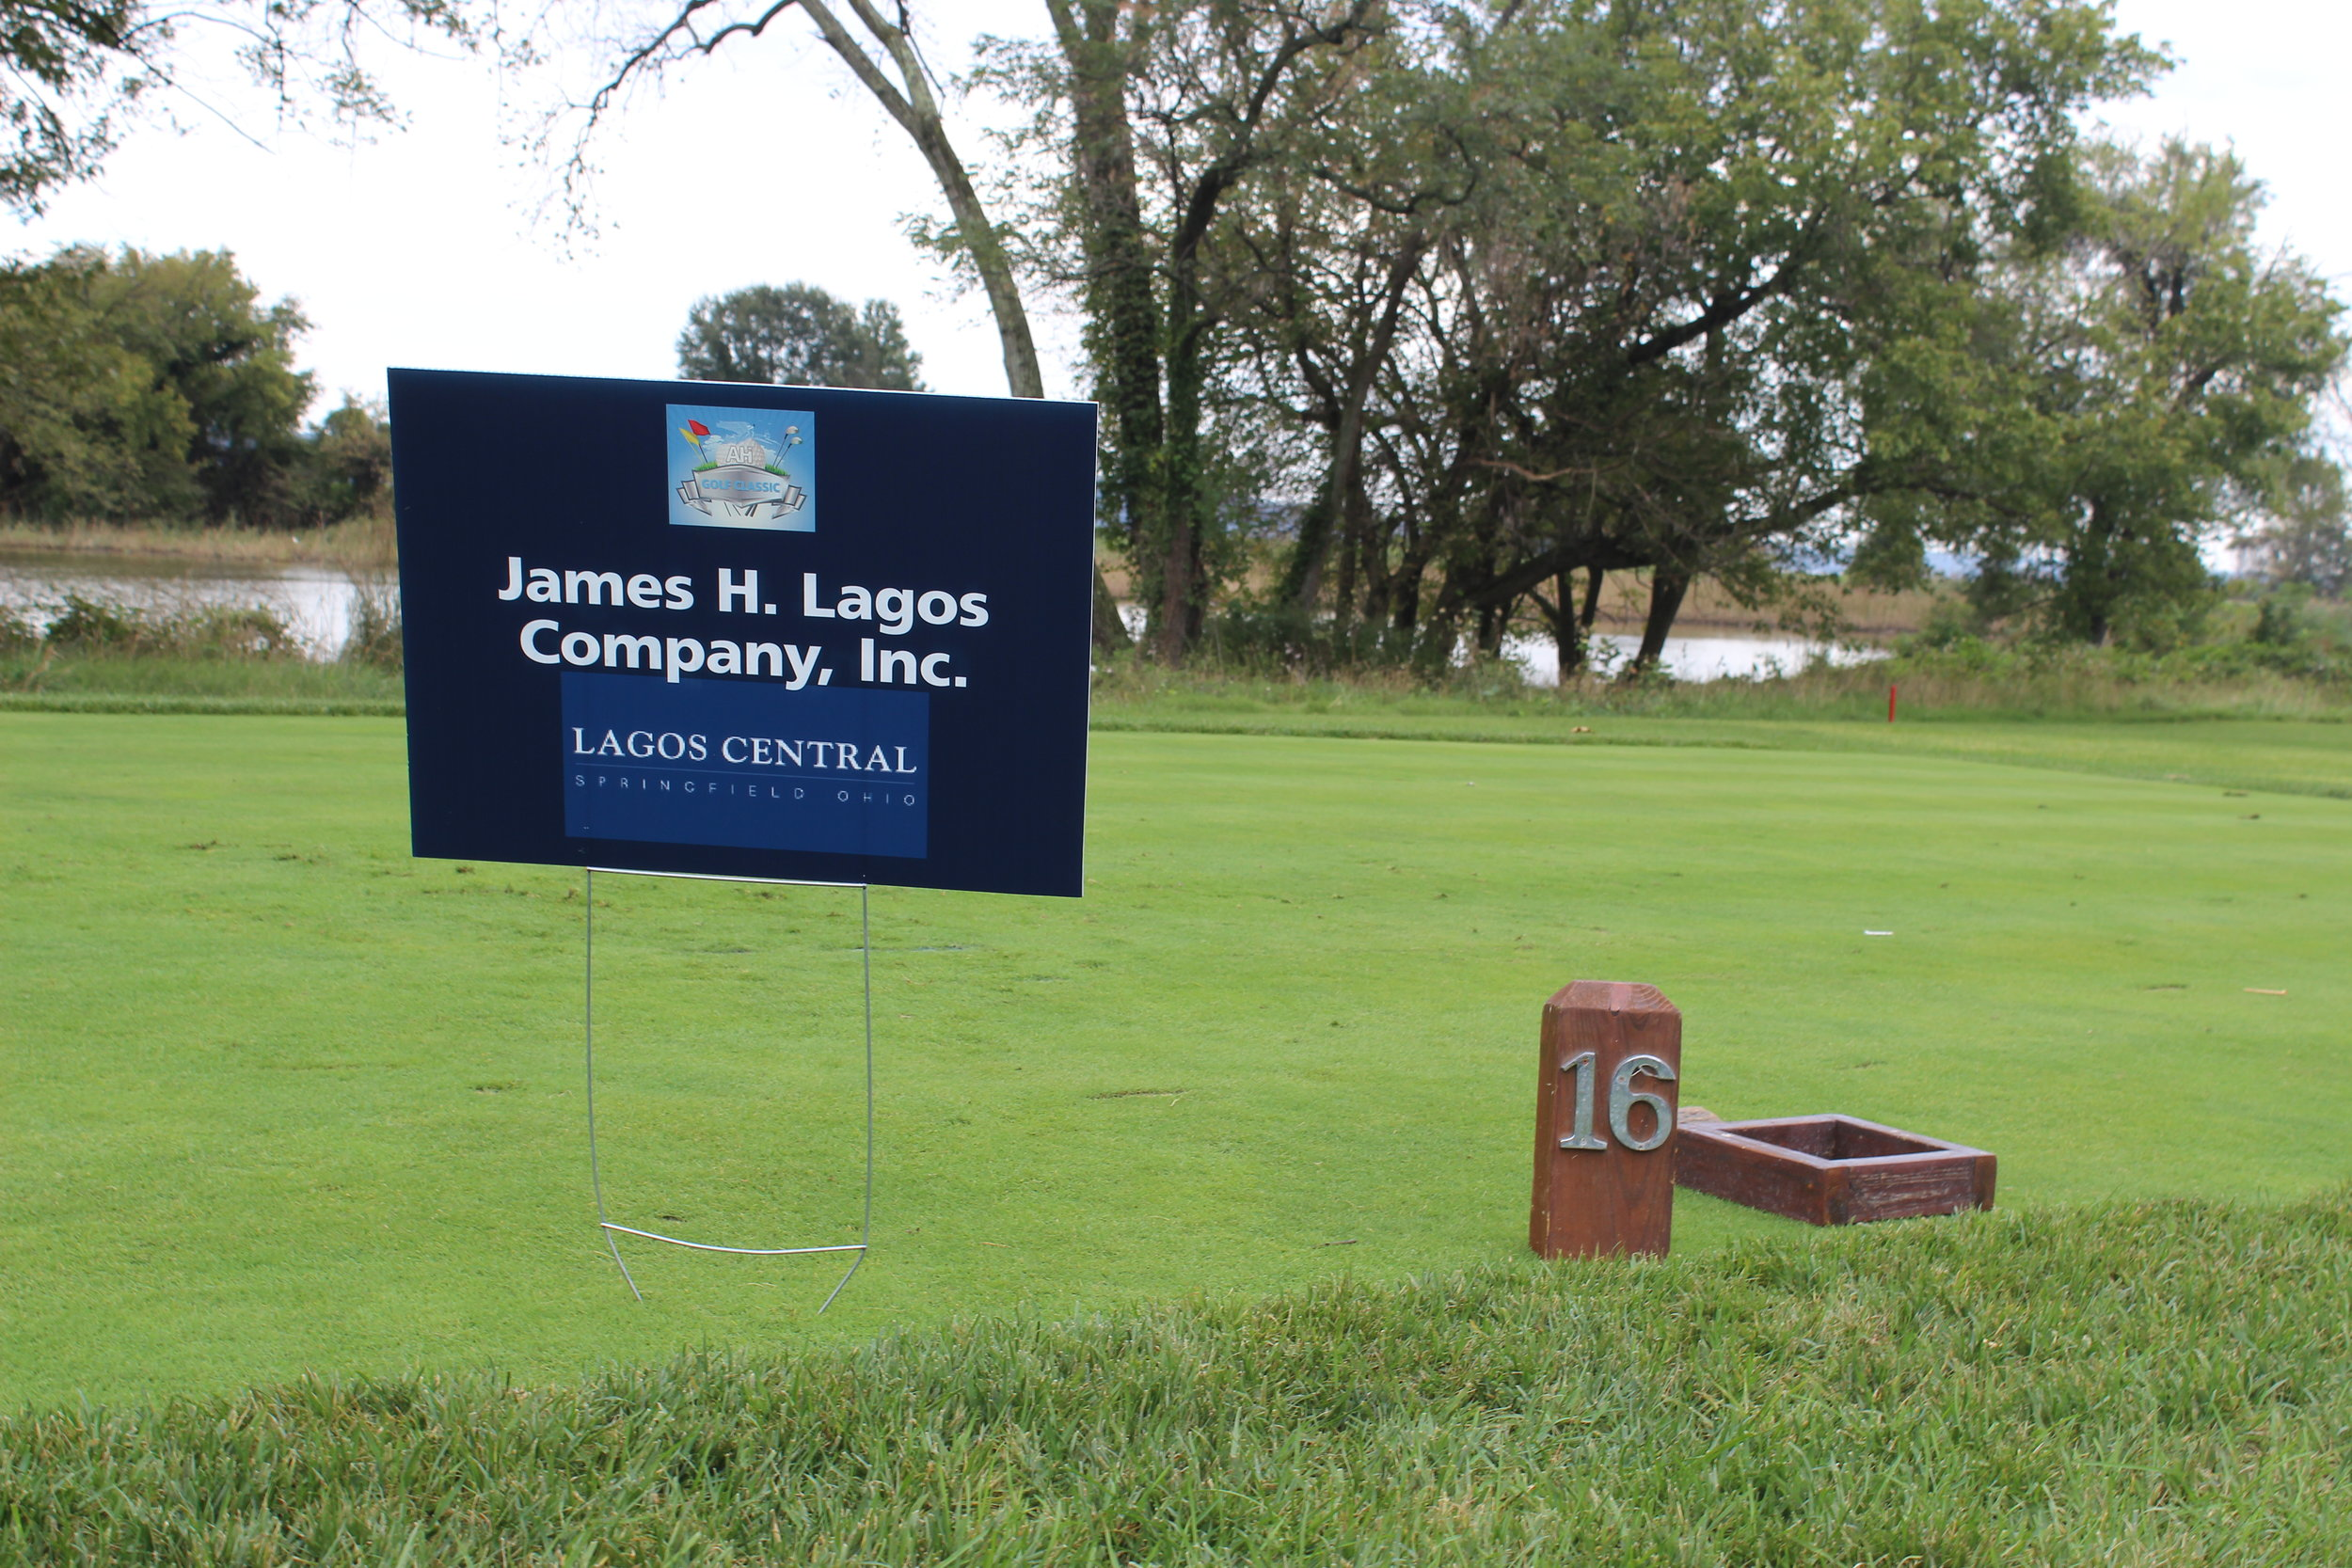 James H. Lagos Company, Inc., Hole Sponsor.